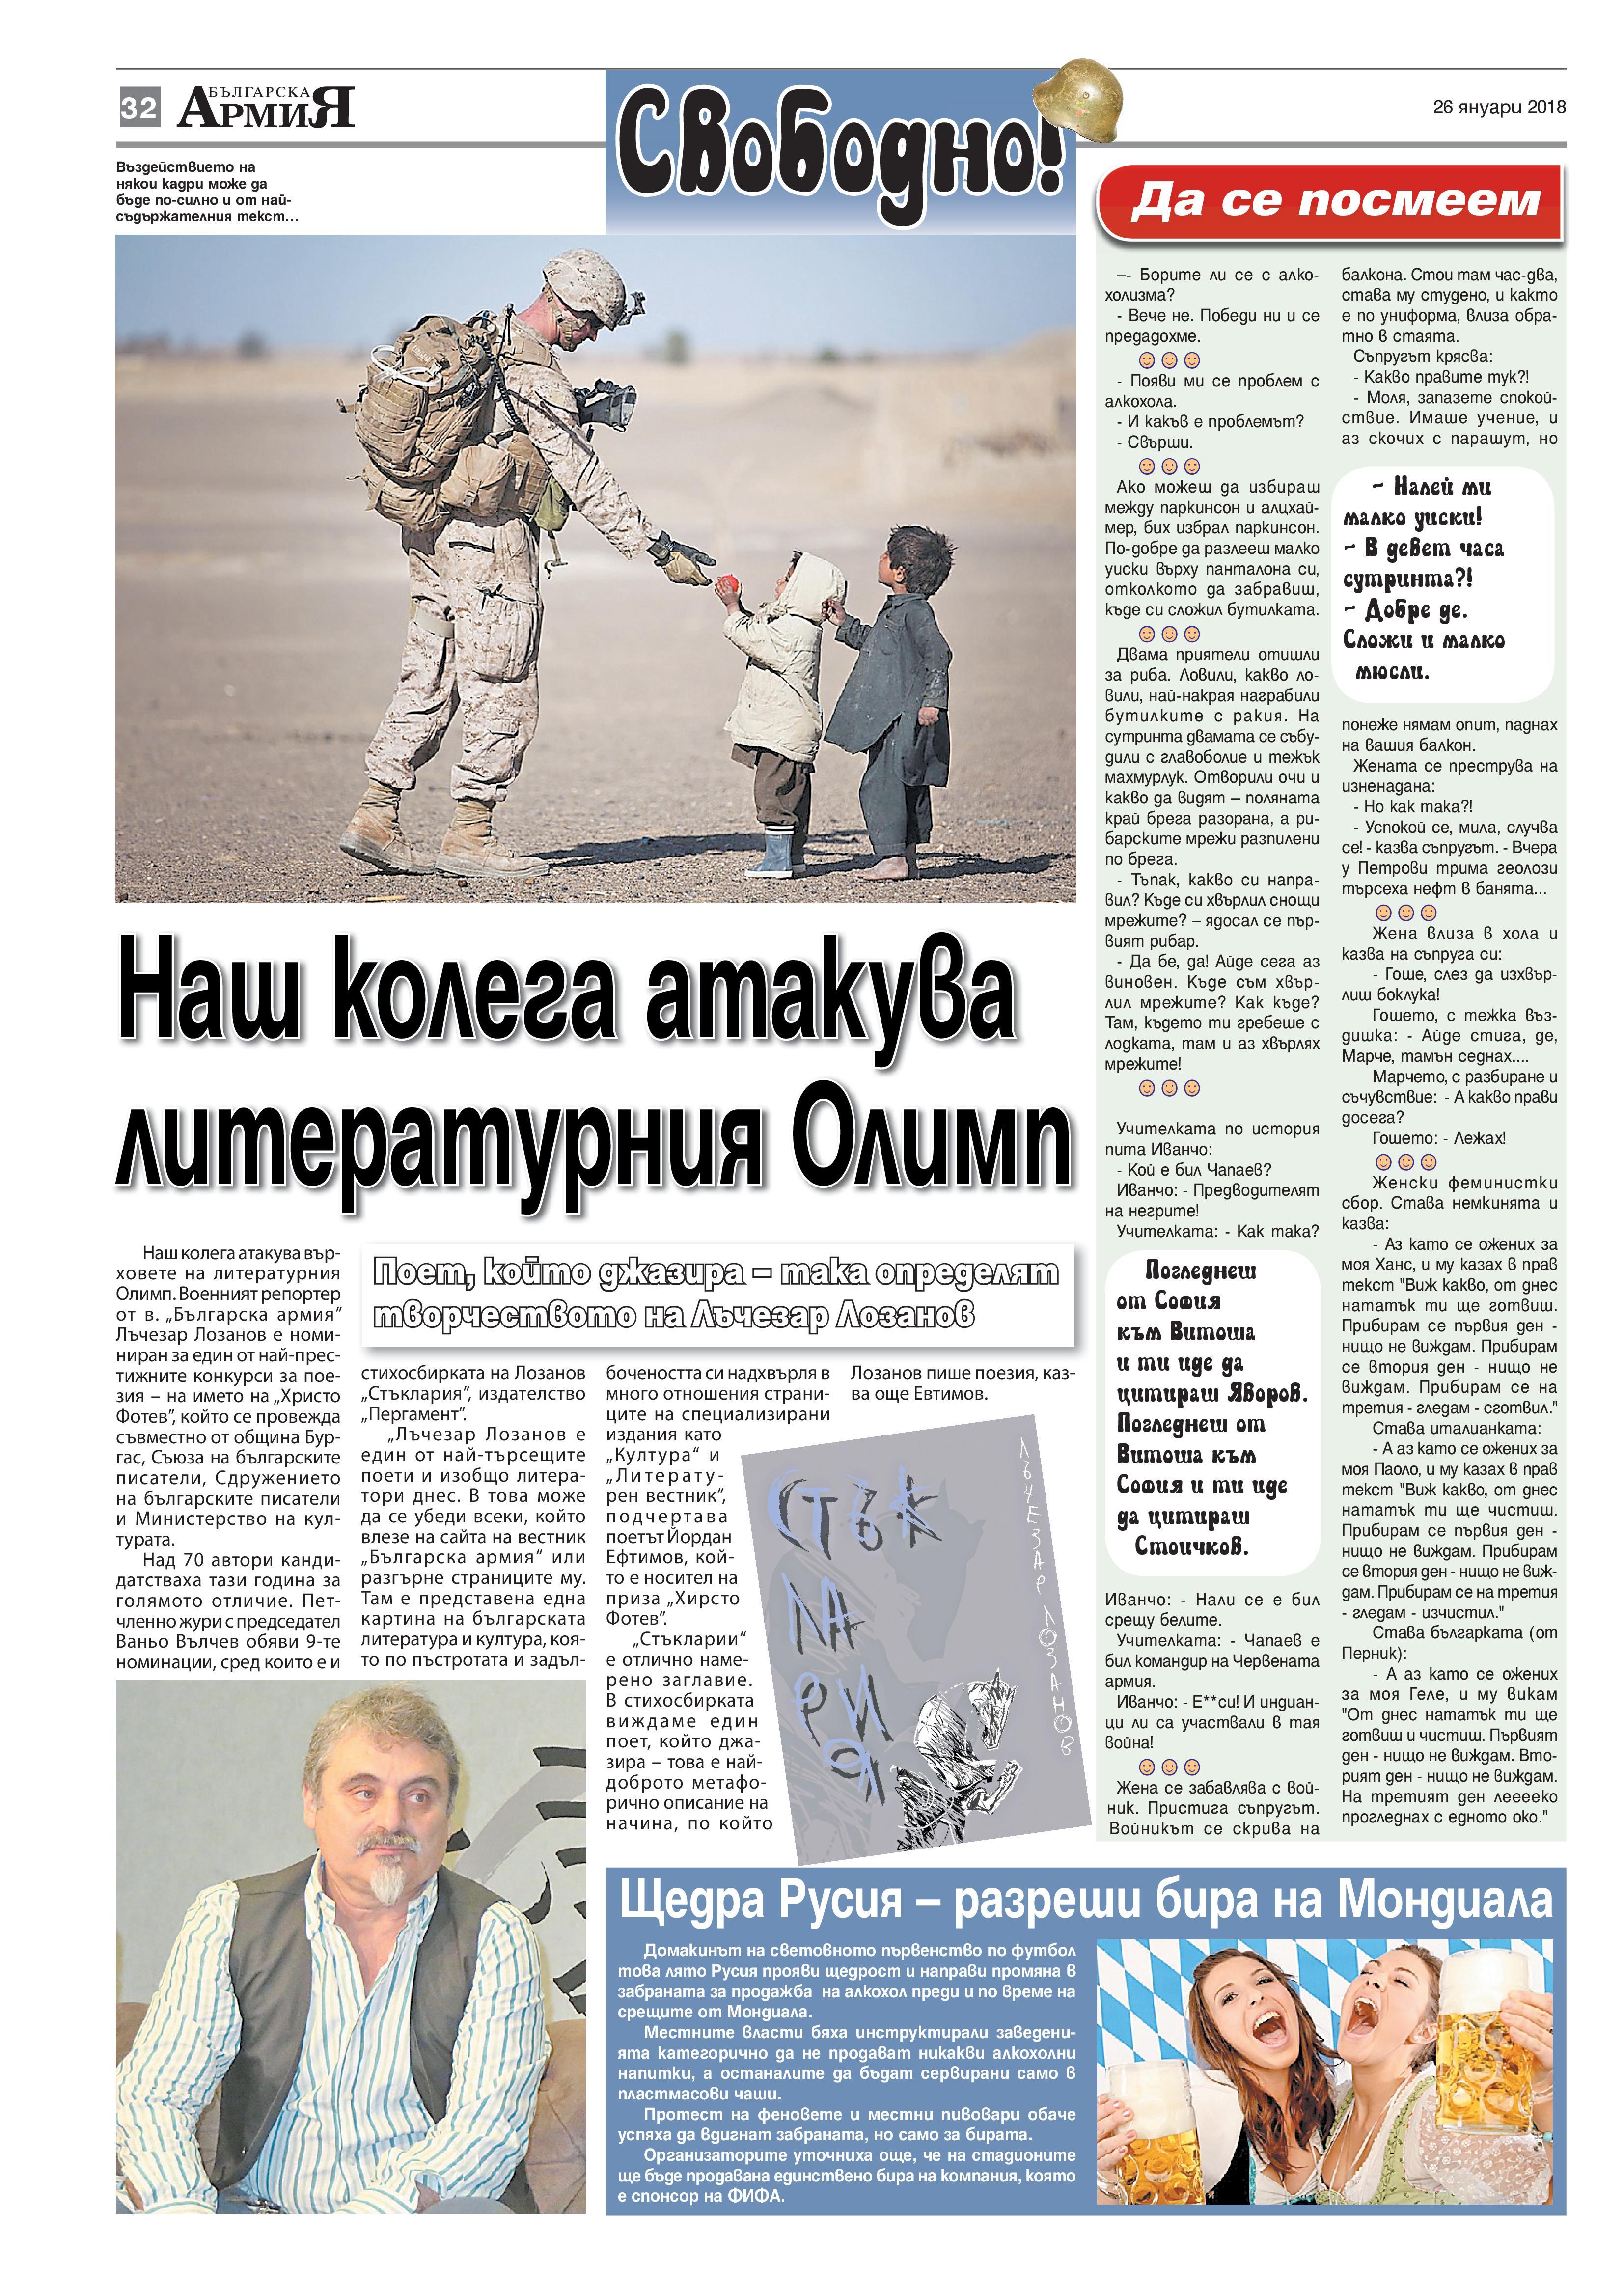 http://armymedia.bg/wp-content/uploads/2015/06/32-17.jpg